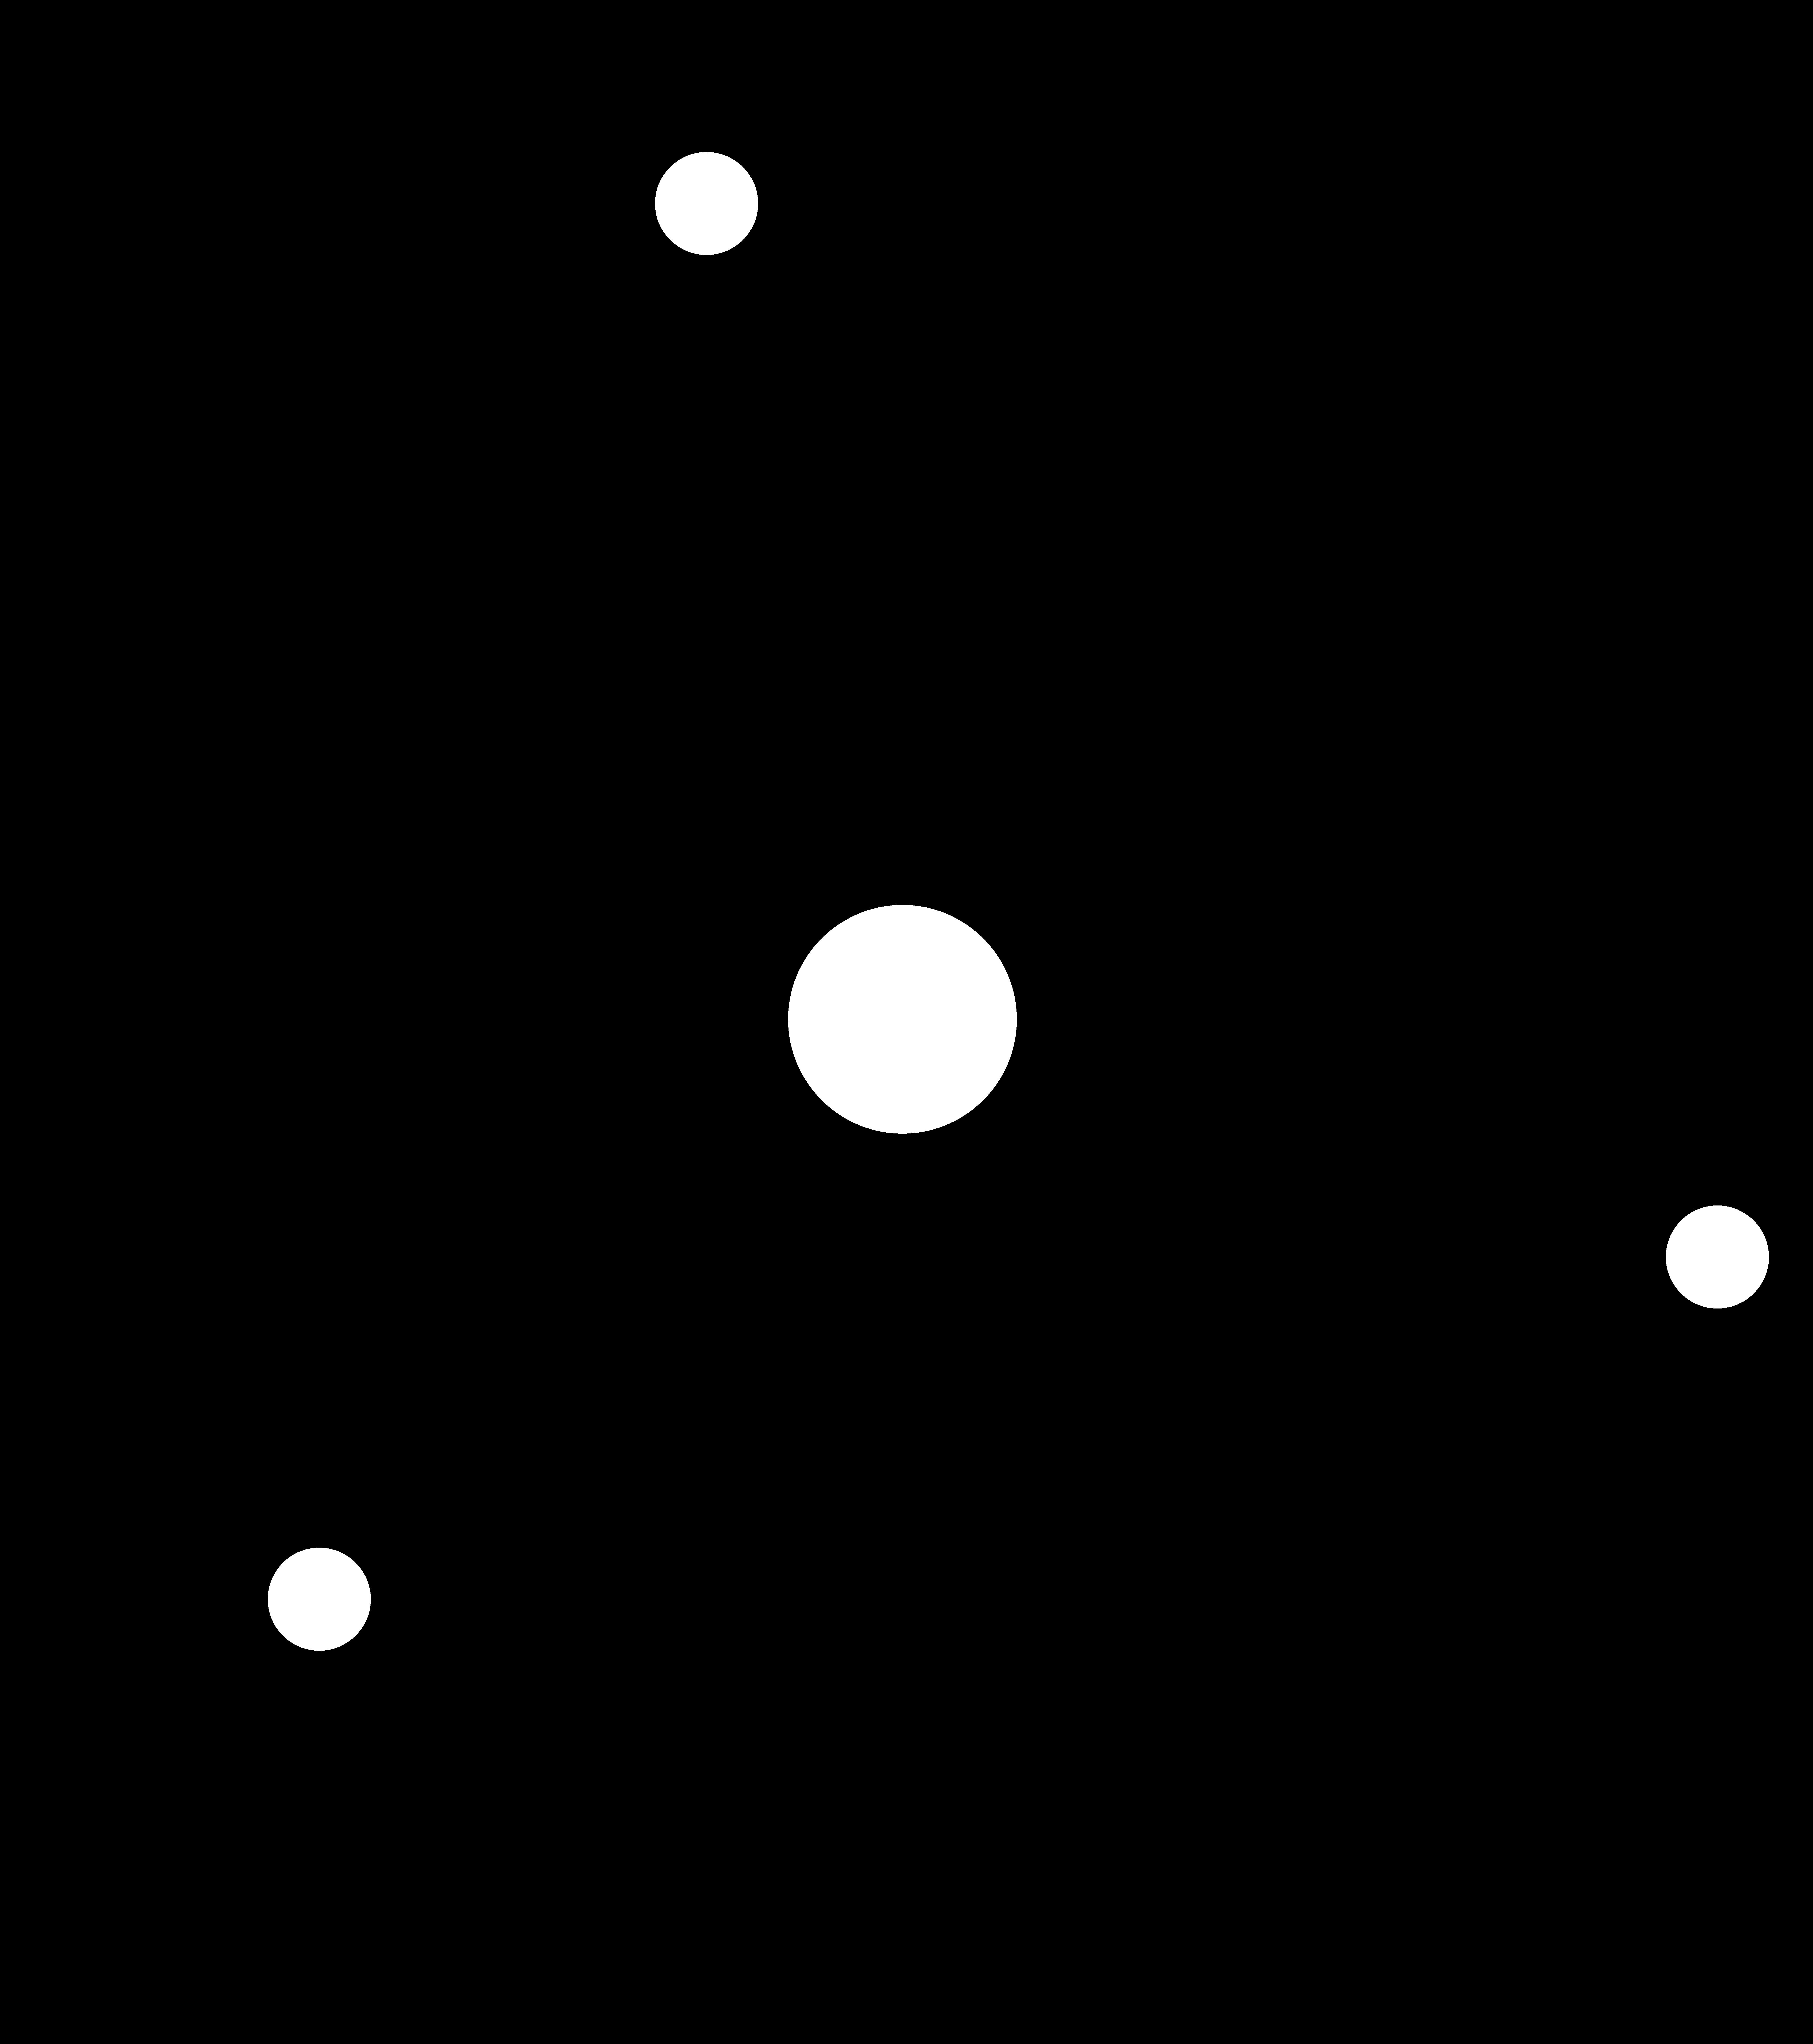 6792x7659 Atoms Cliparts